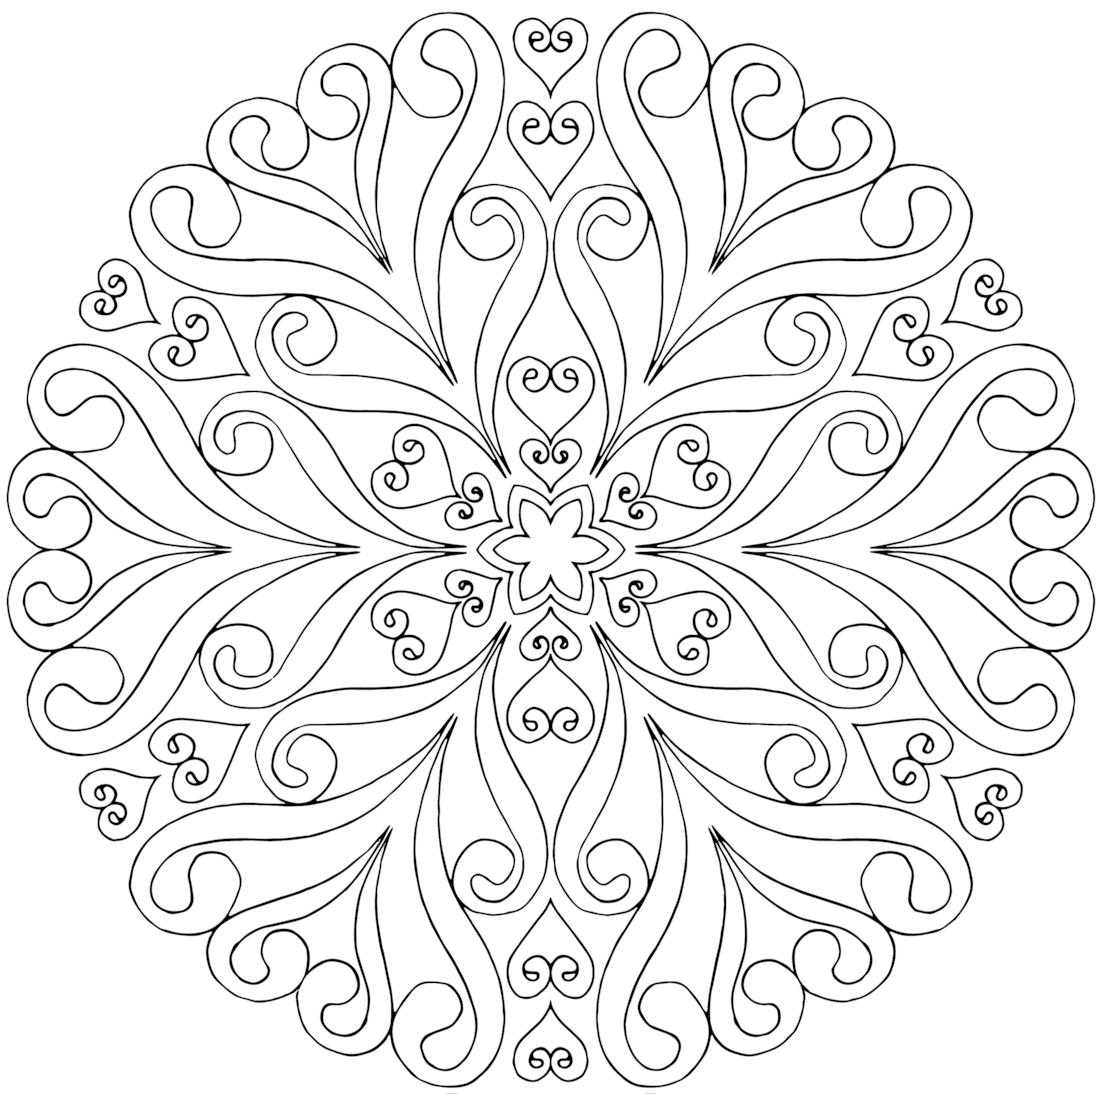 Pinlizet Barokas Koldan On Mandala | Mandala Coloring Pages - Free Printable Mandalas